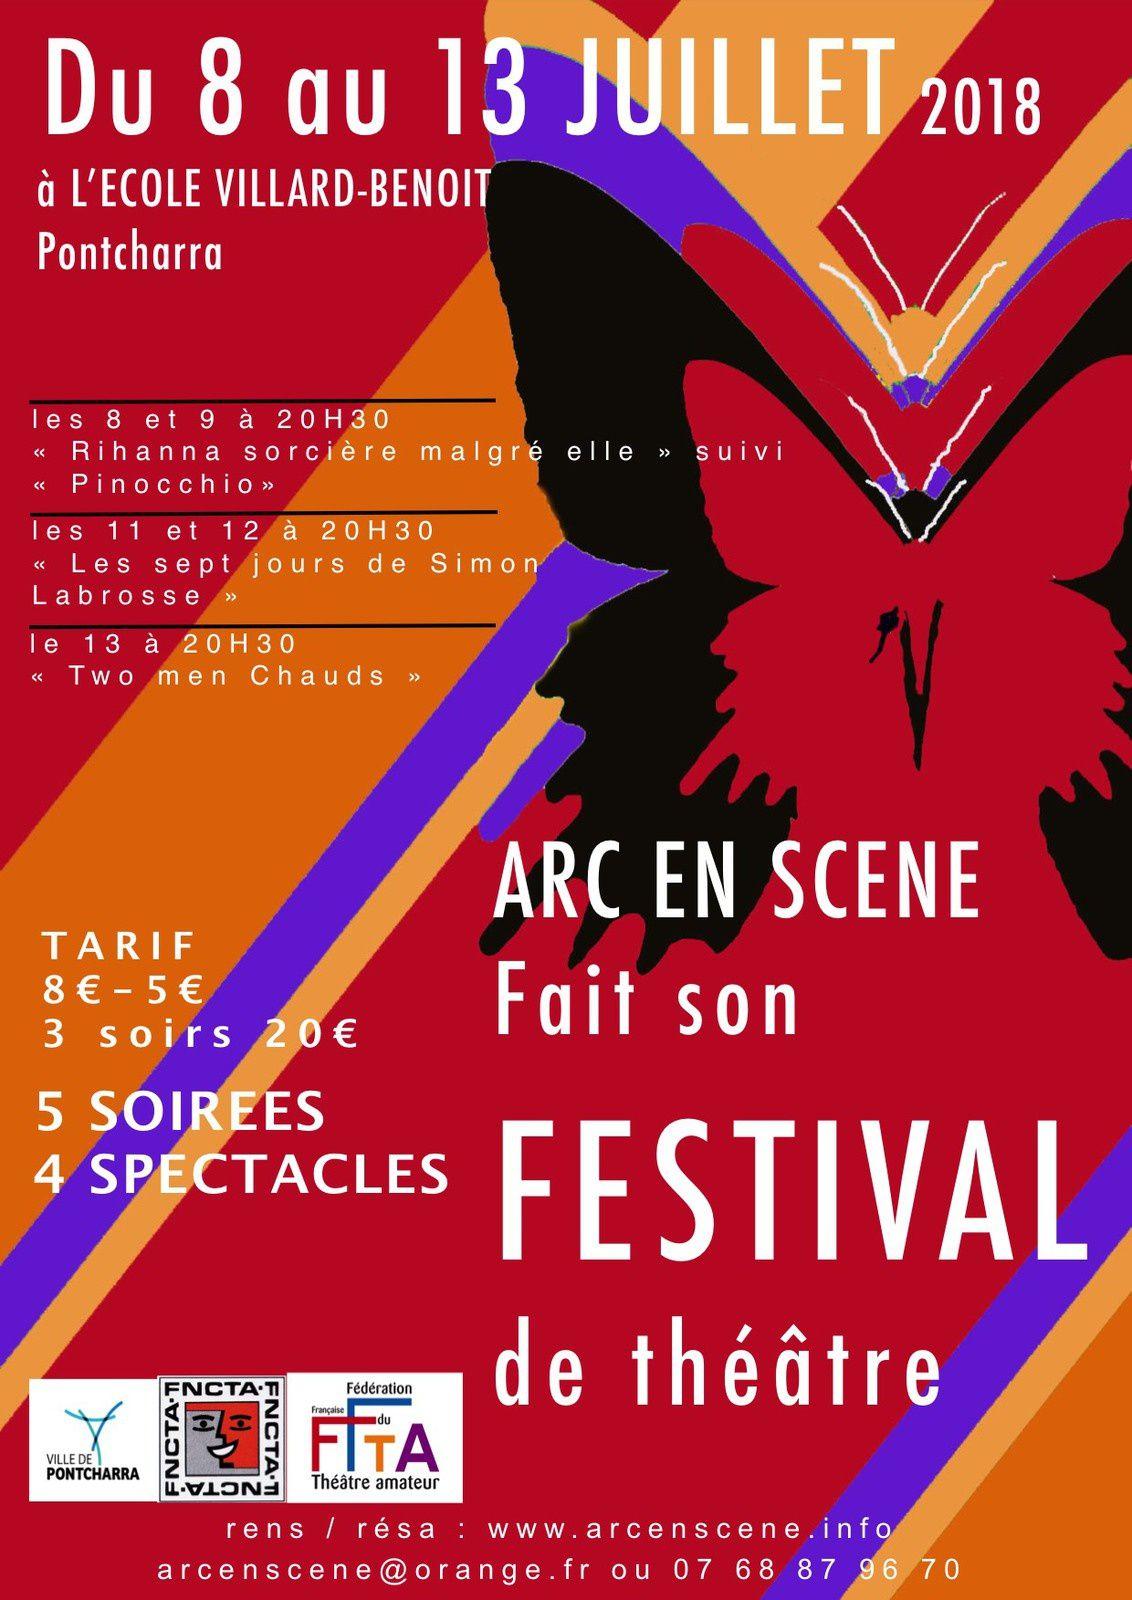 ARC EN SCENE FAIT SON FESTIVAL